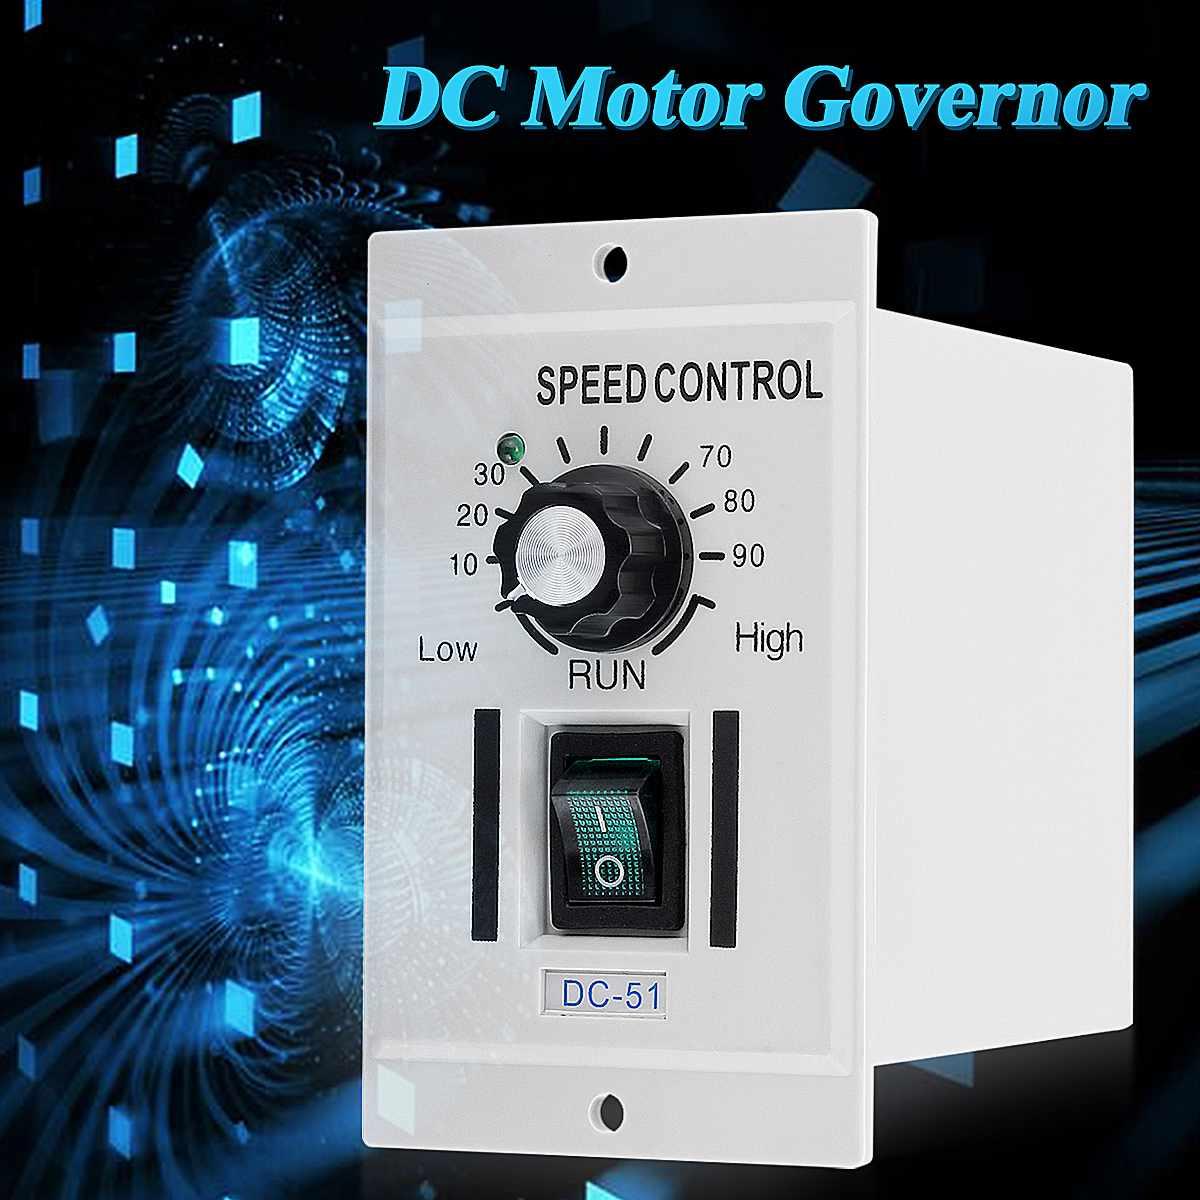 Digital 400W DC 0-90V Adjustable Speed Motor Controller Rotary Knob Voltage Regulator Controller DC Motor Variable Control